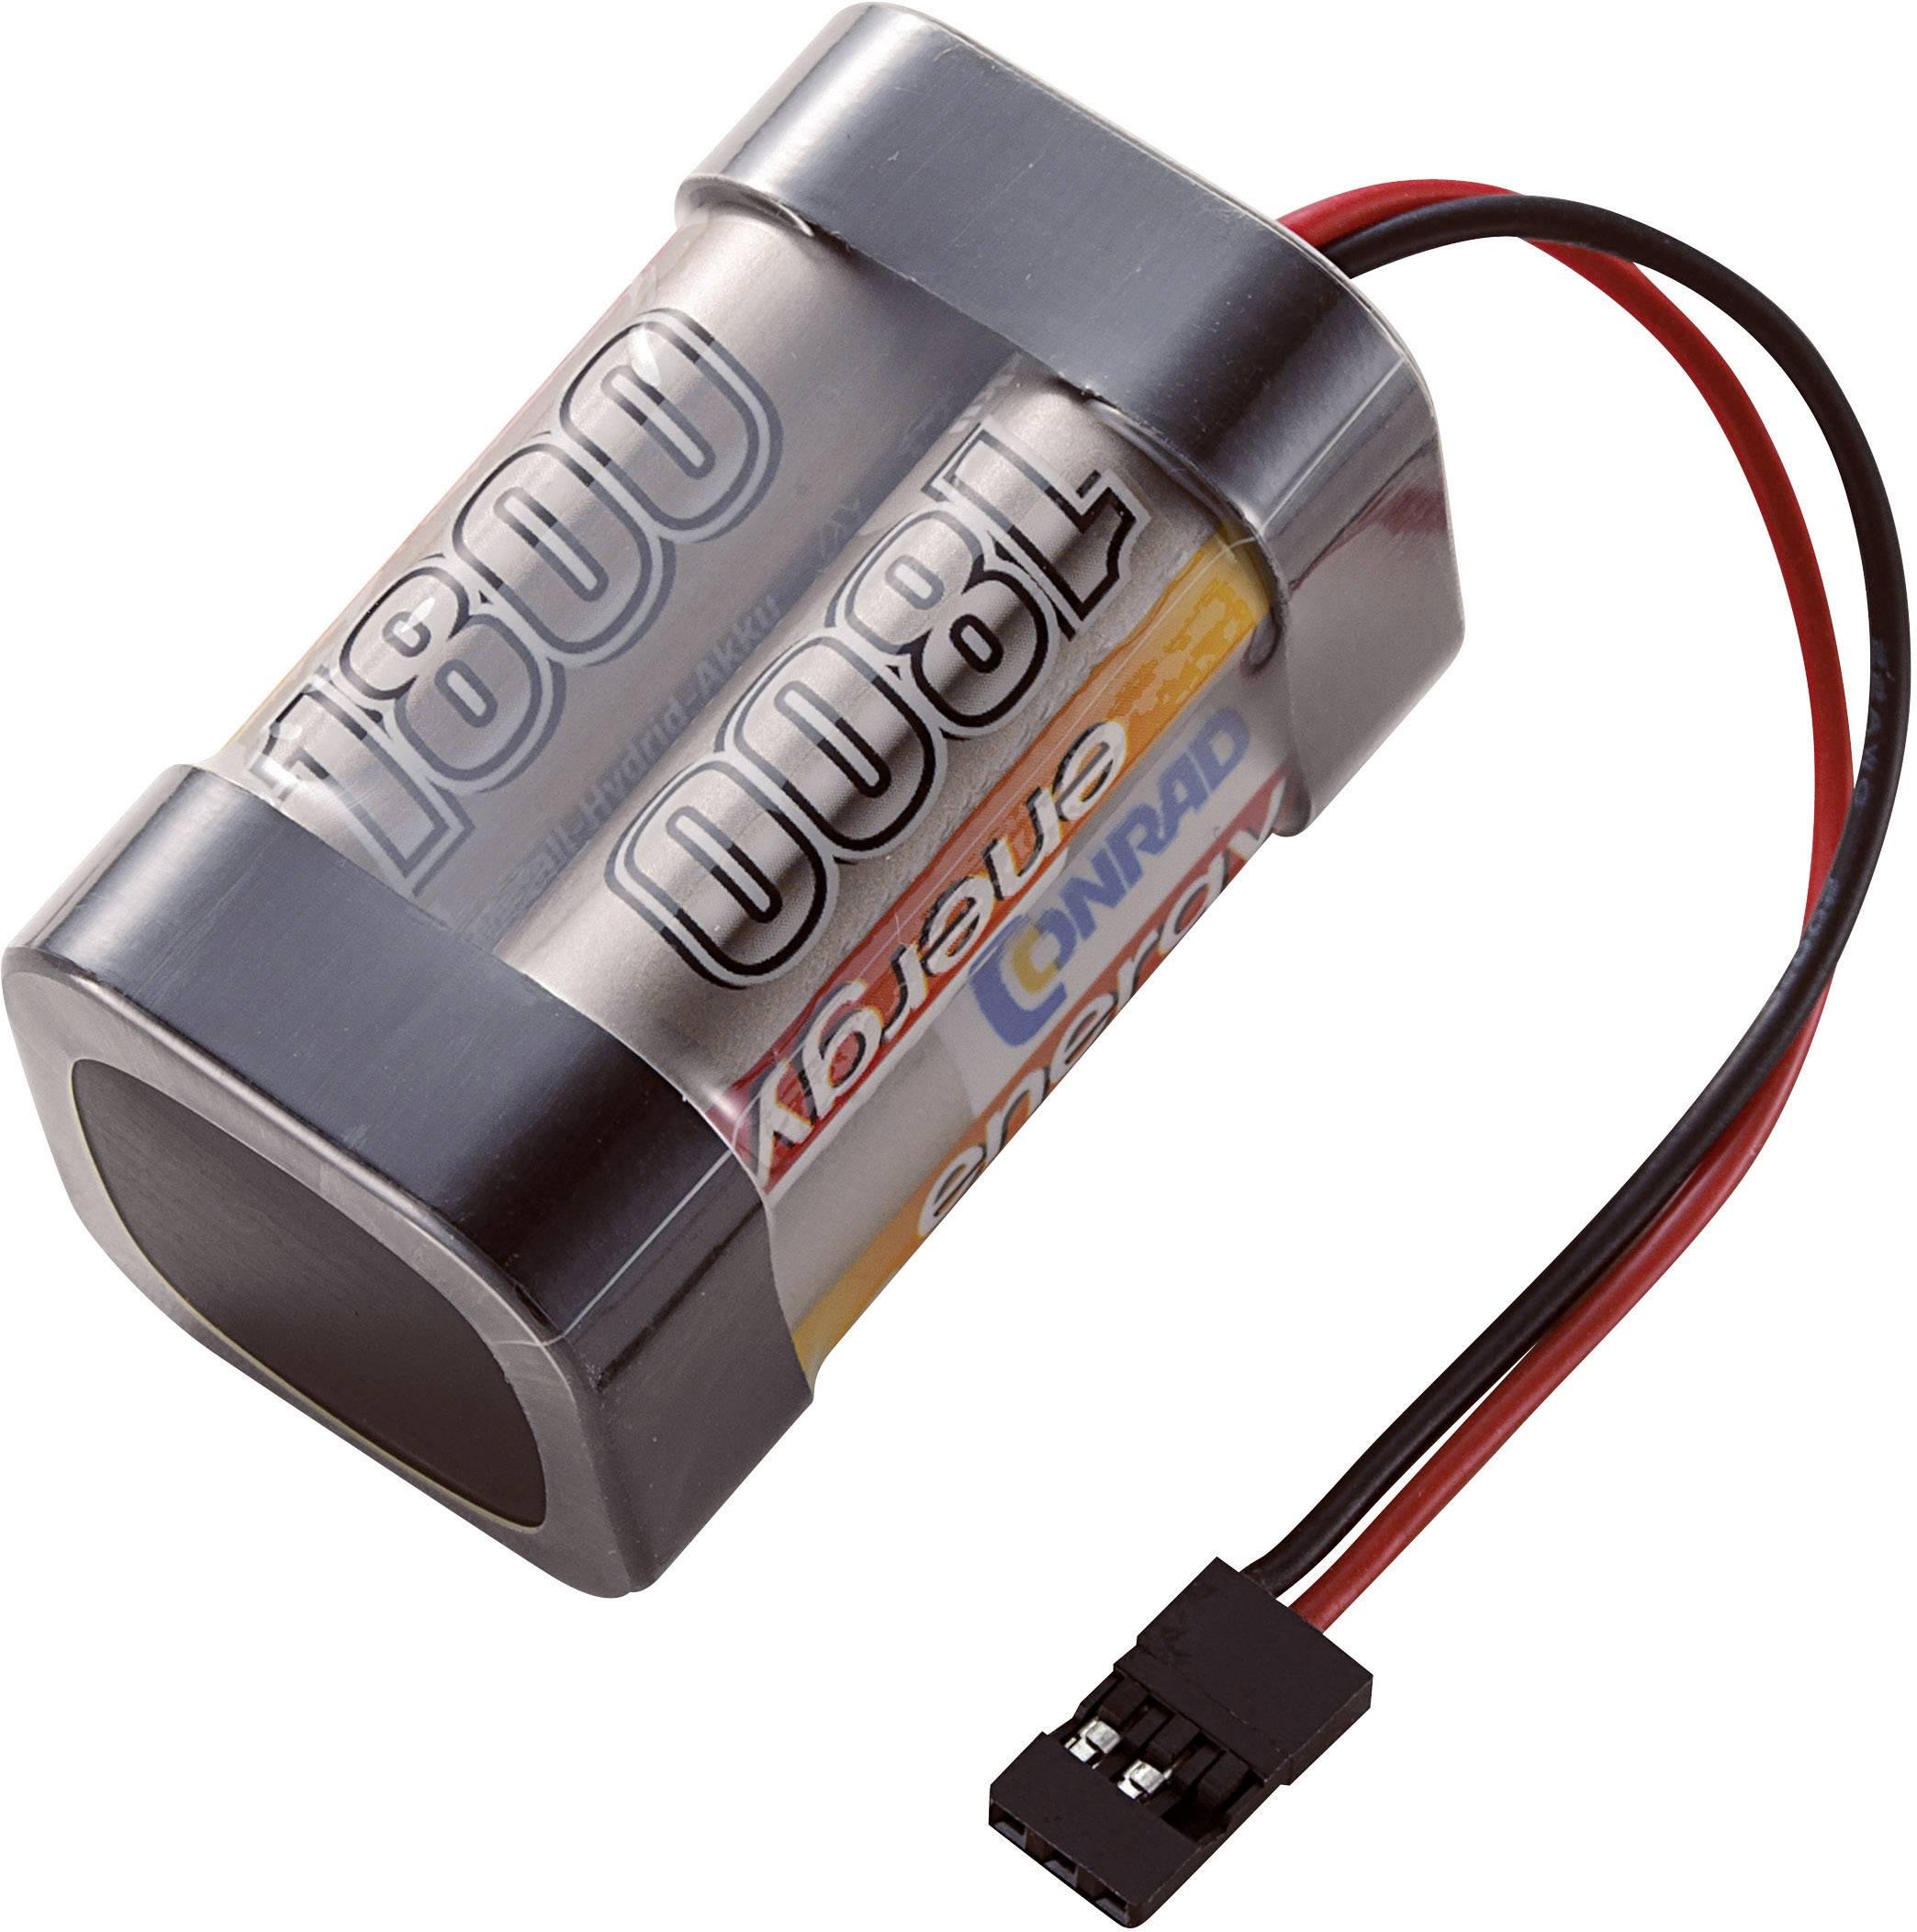 Akupack přijímače NiMH Conrad Energy AA, 4,8 V, 1800 mAh, Block, JR